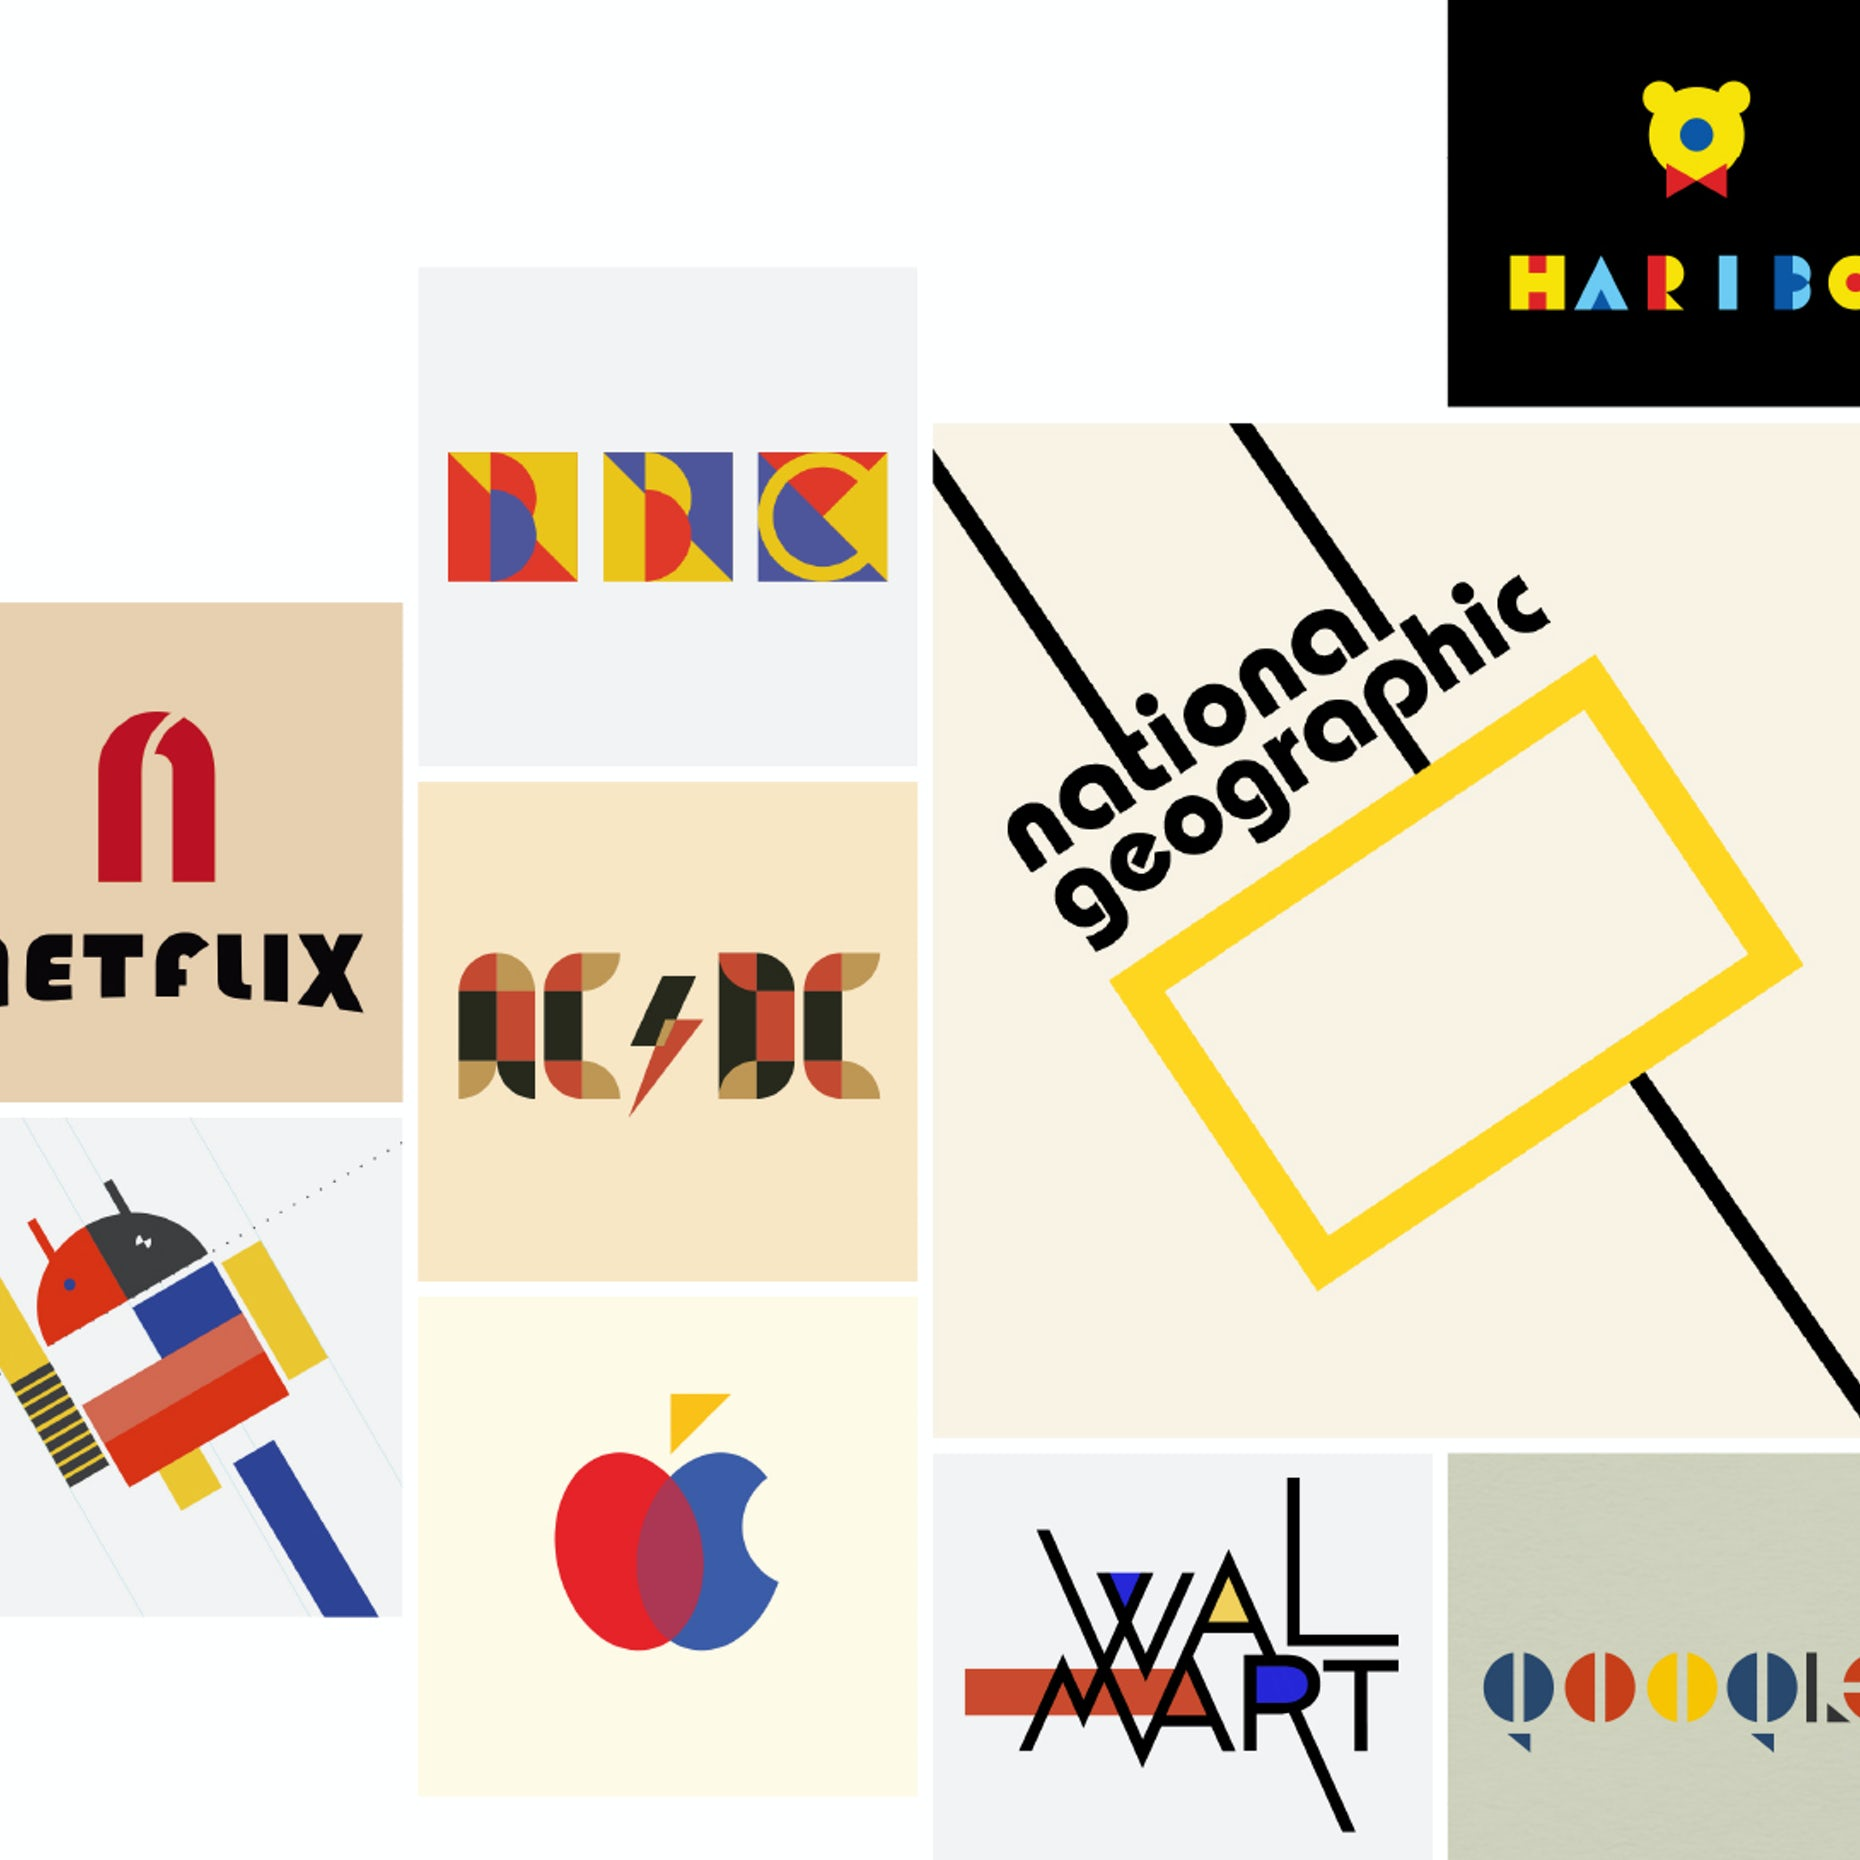 755e1d541edd40 100 Jahre Bauhaus  Bekannte Logos im Bauhaus-Stil - 99designs